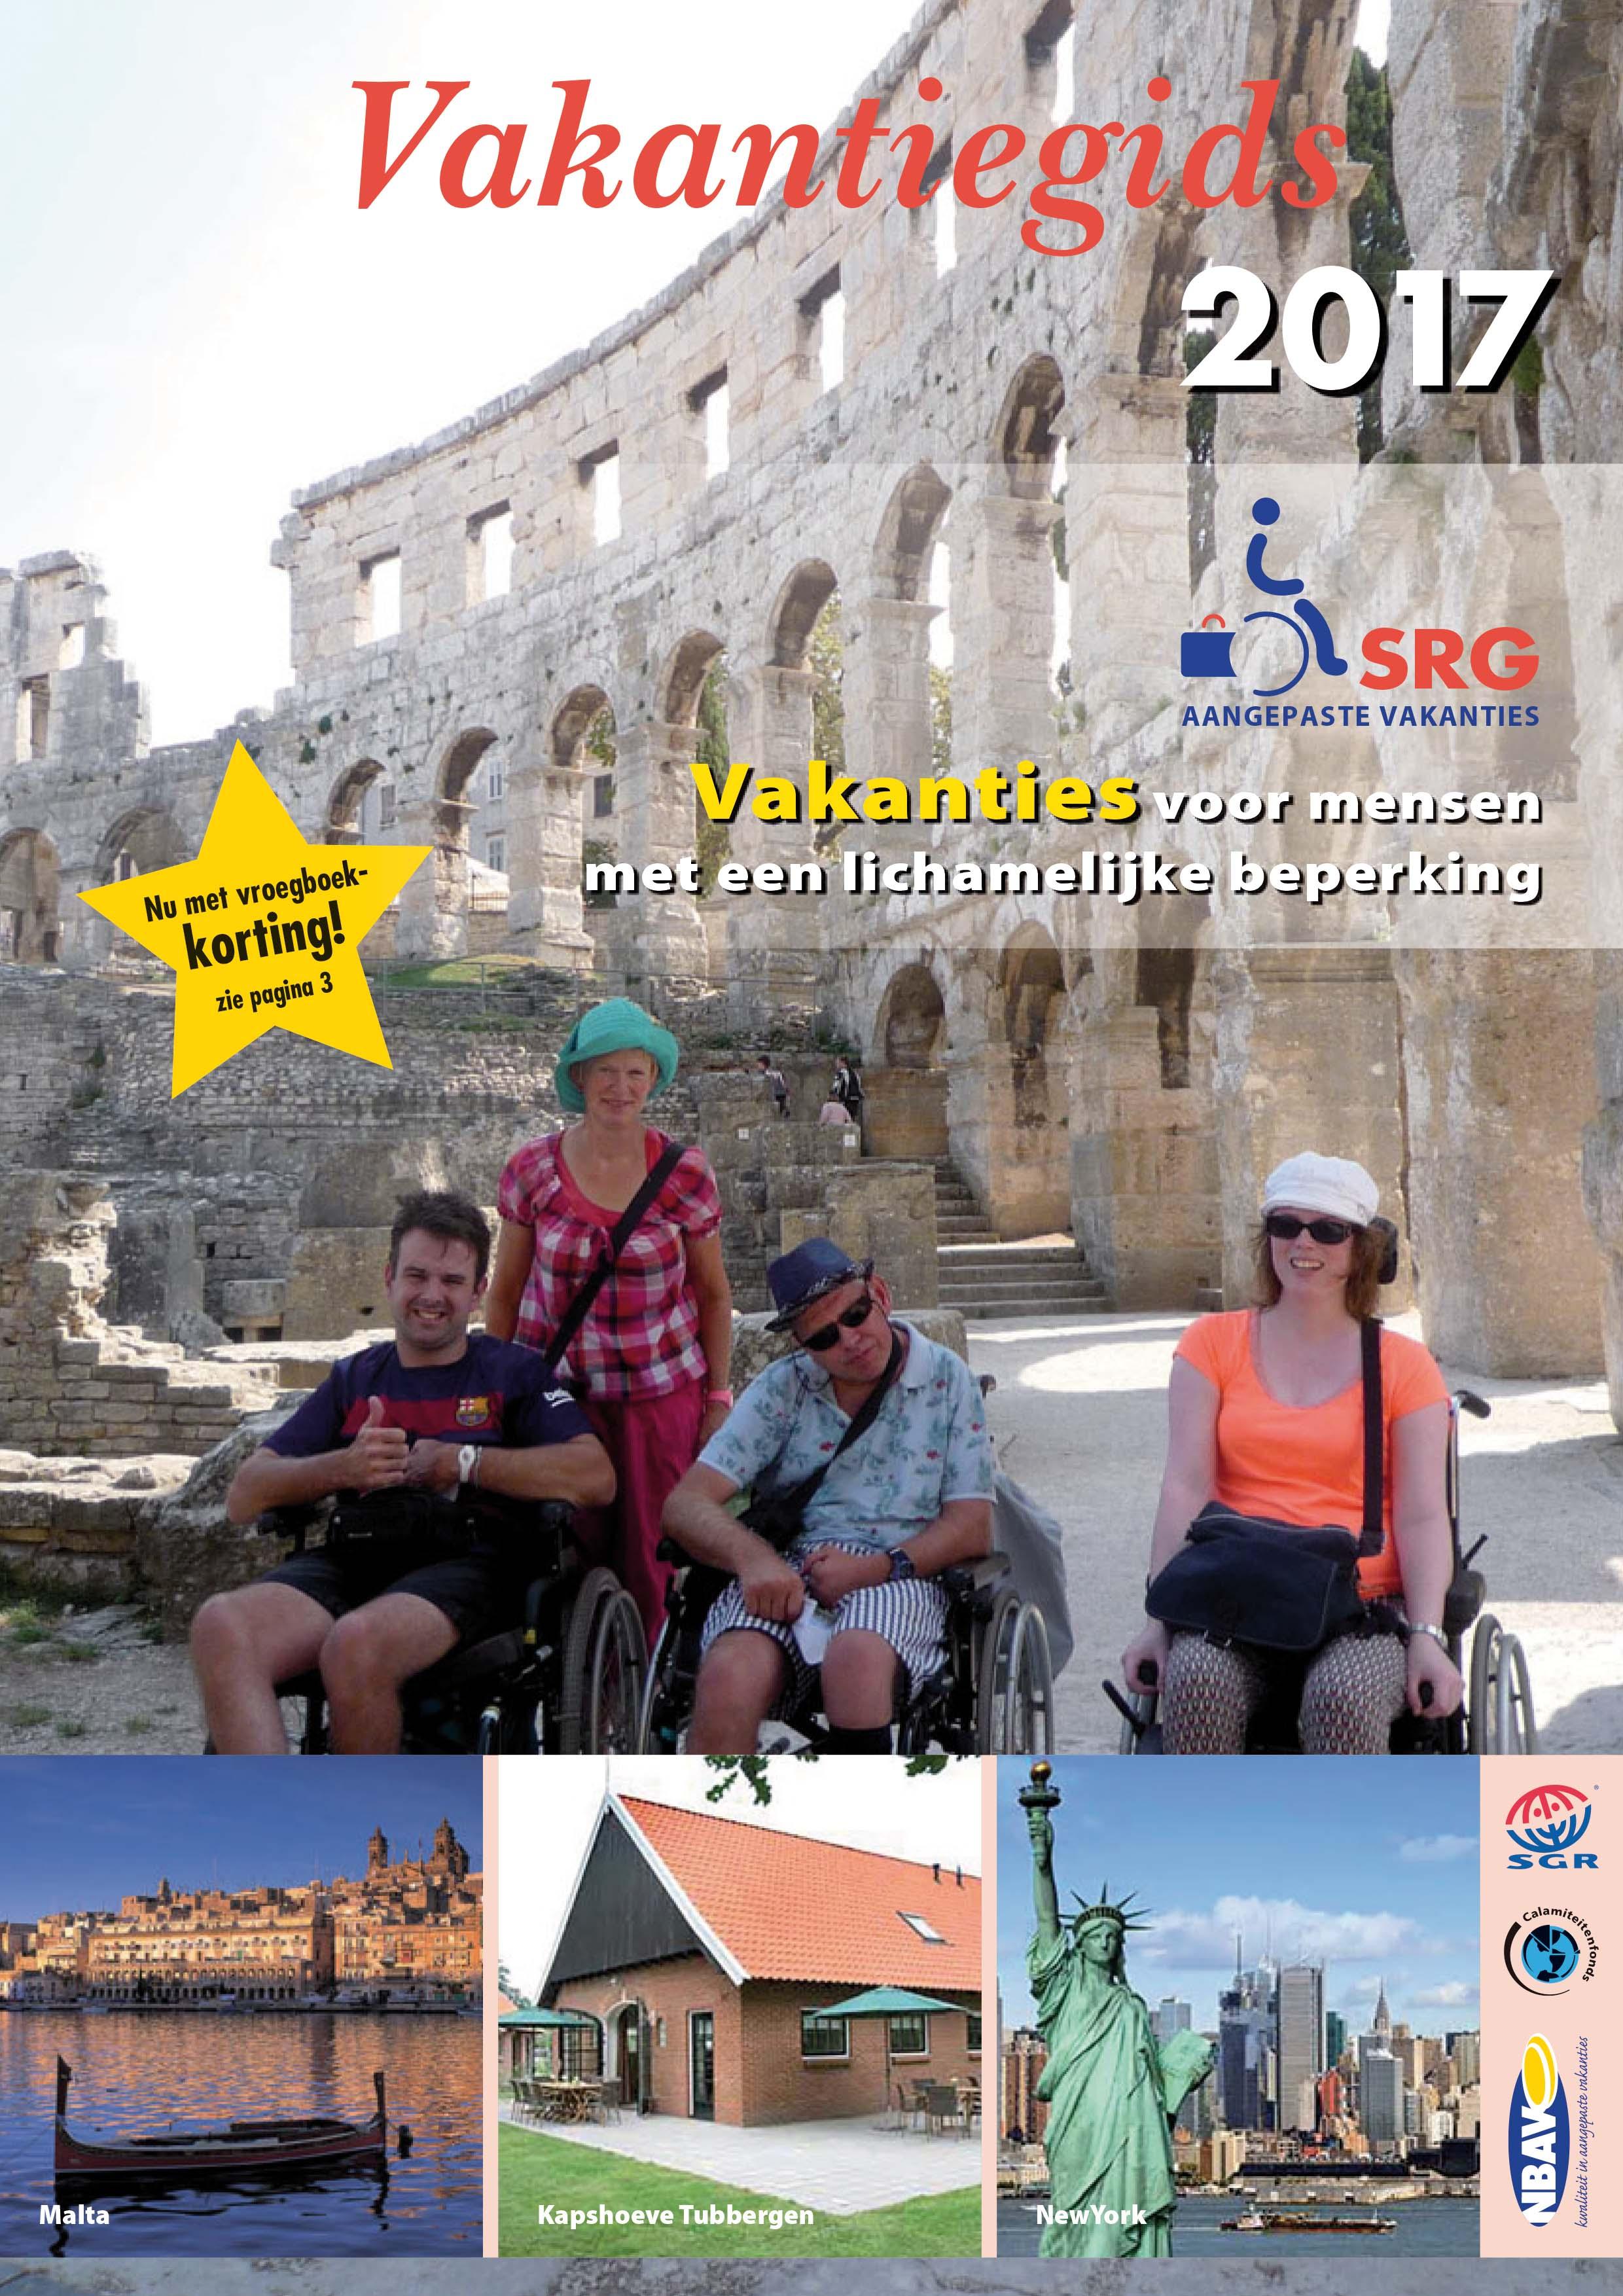 SRG Vakantiegids 2017